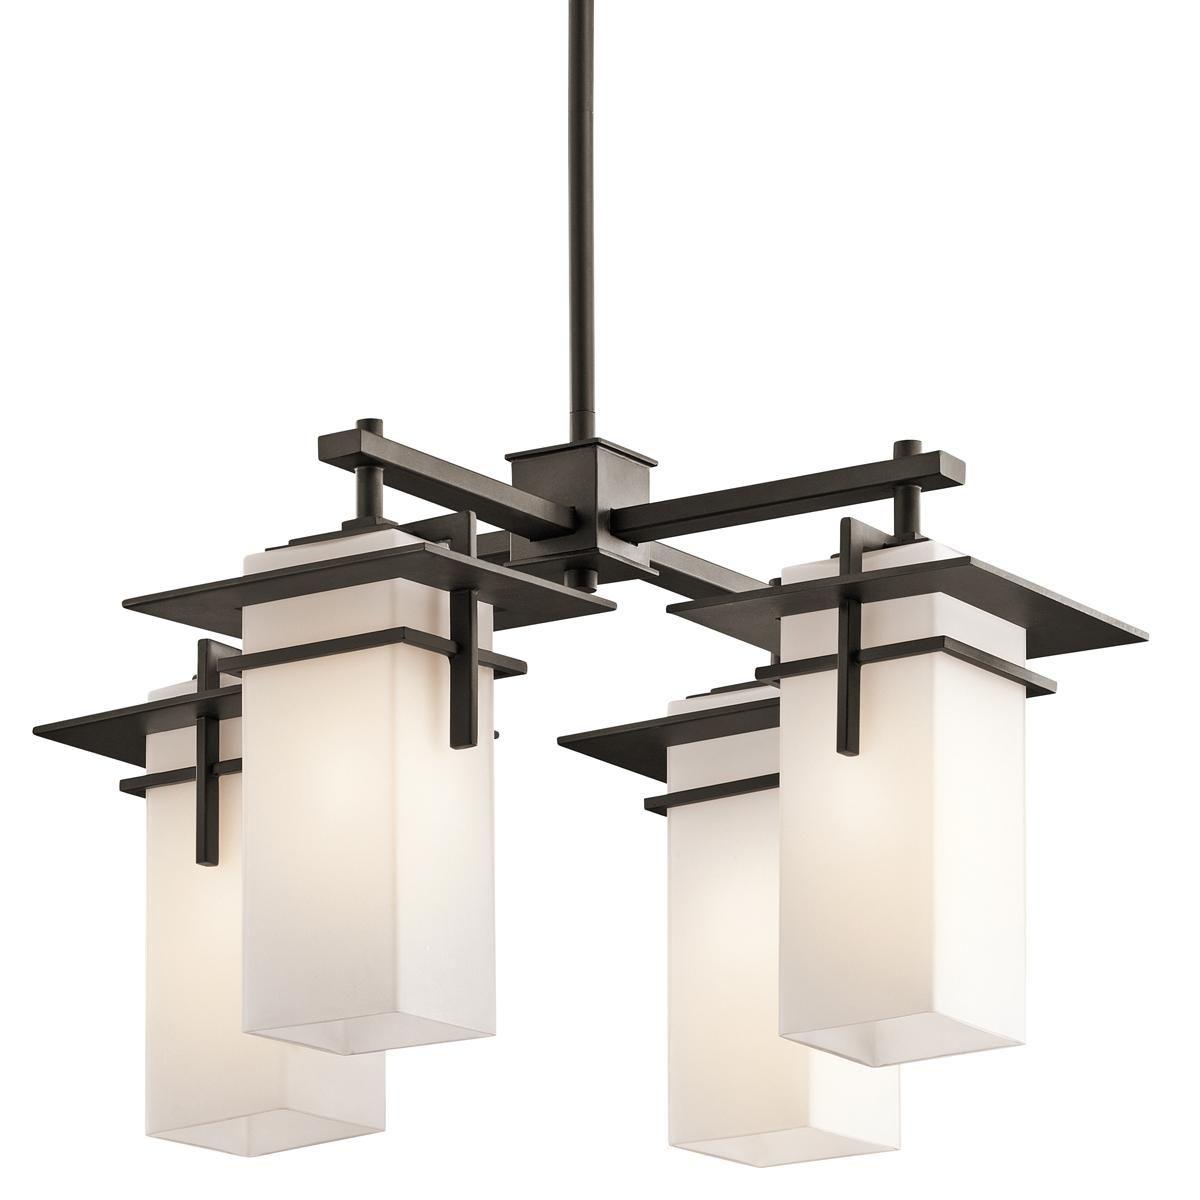 Indoor Outdoor Modern Mission 4 Light Chandelier From Asian modern ...